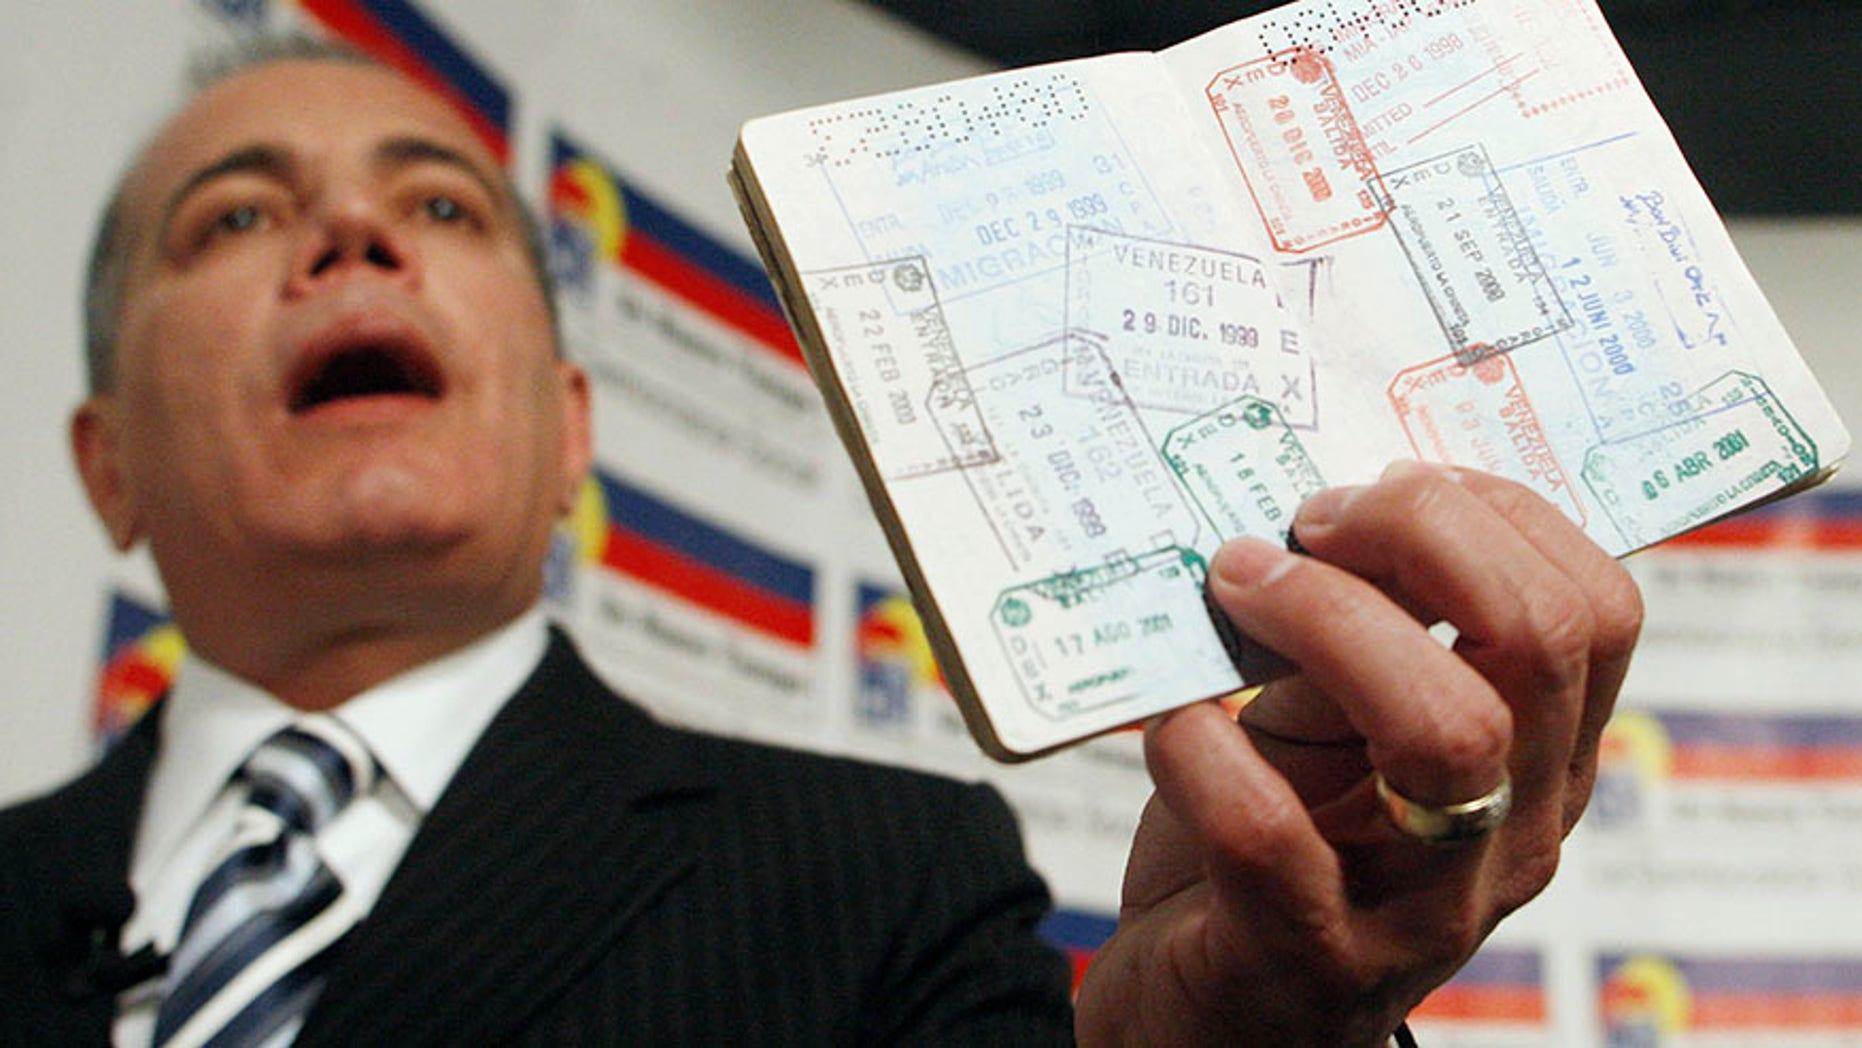 Venezuelan opposition leader Manuel Rosales during a news conference in Lima October 1, 2009.